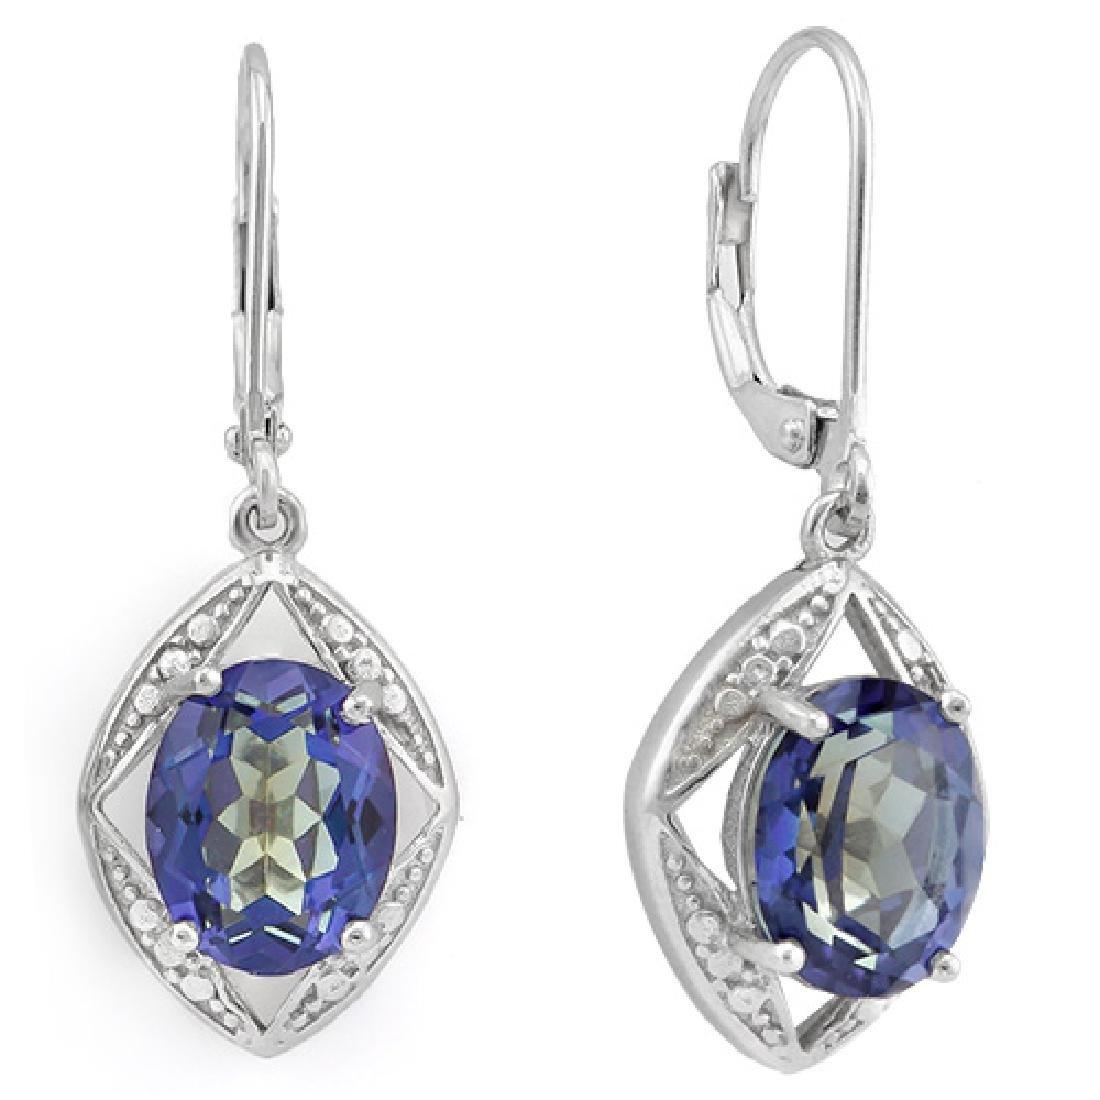 Blue Violet Mystic Topaz Dangle Earrings in Sterling - 2